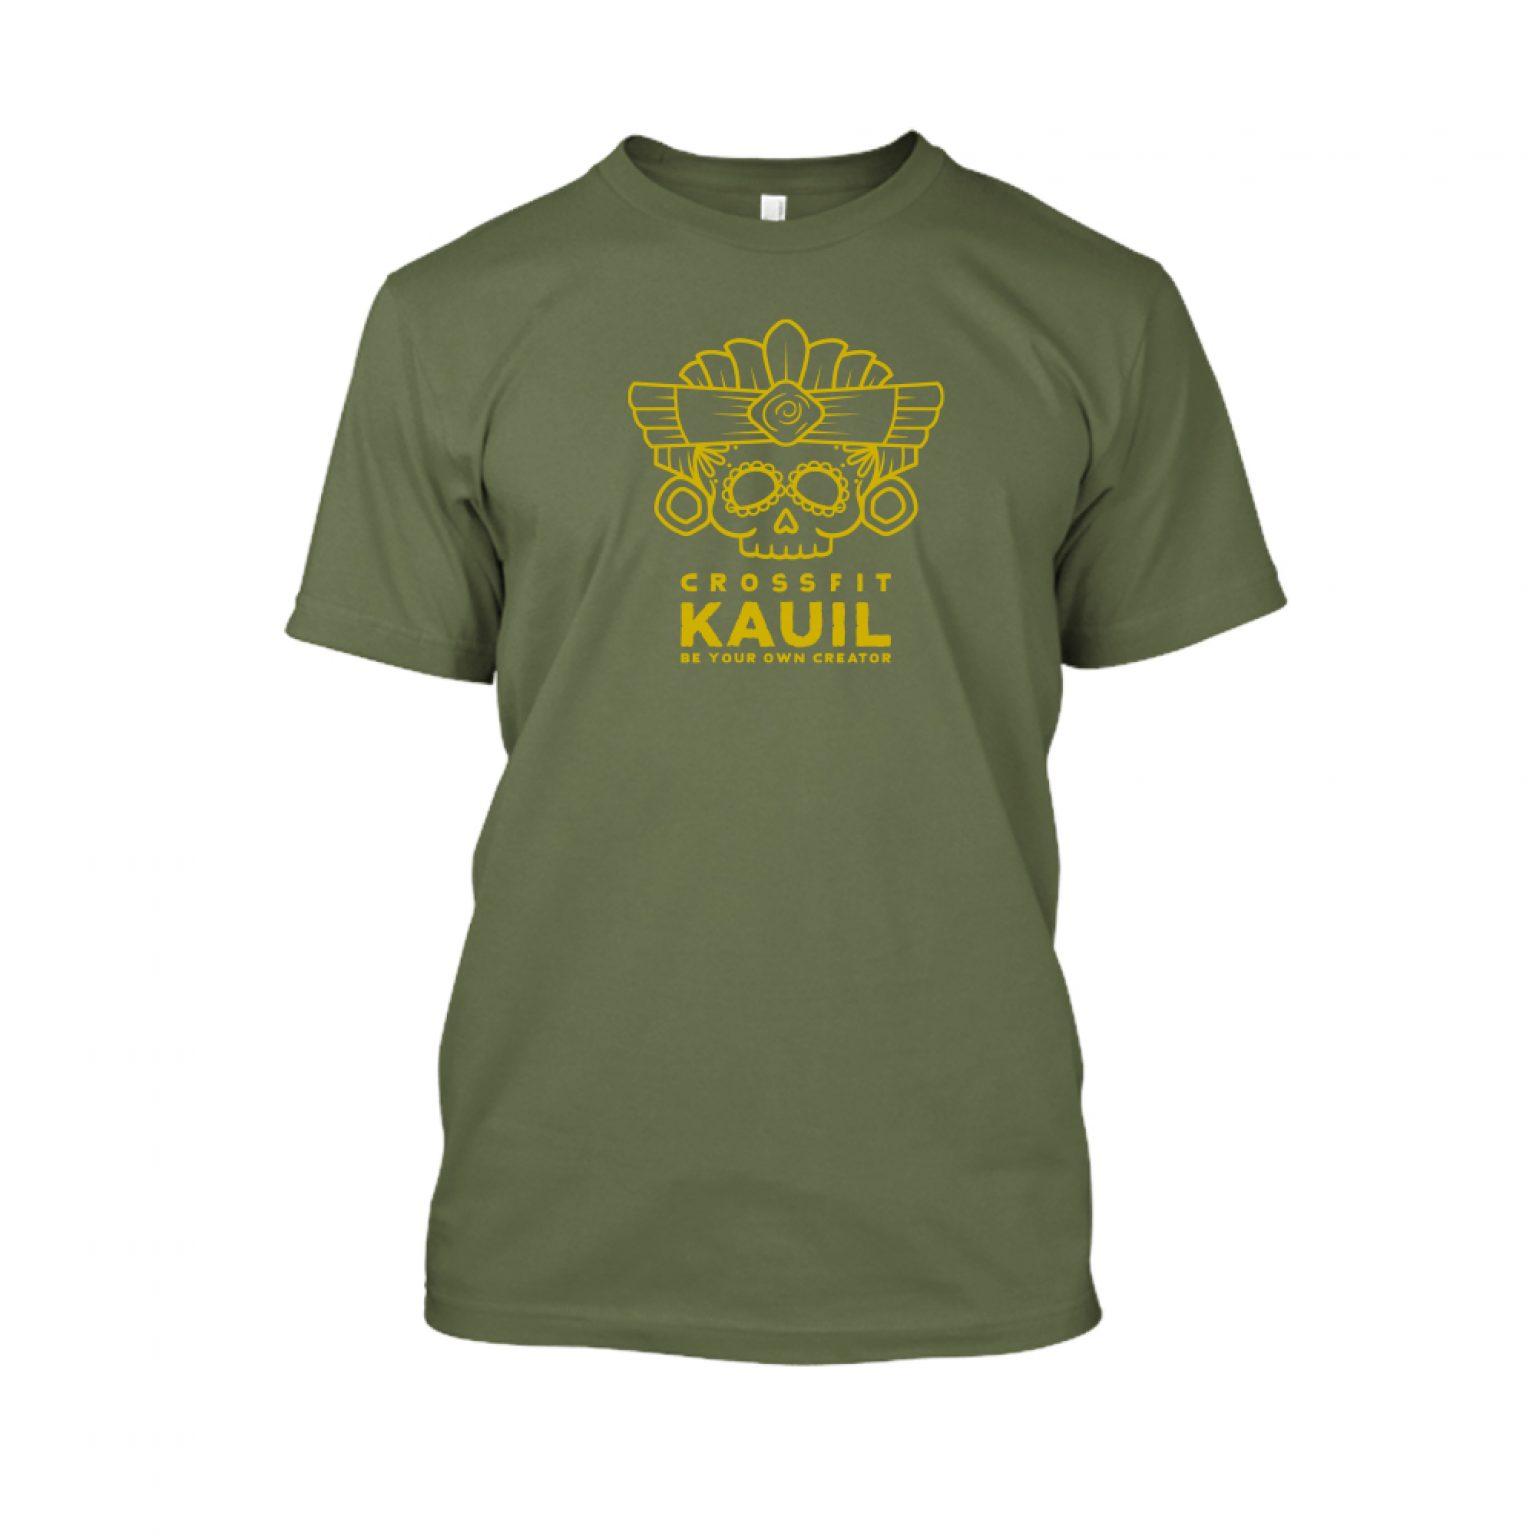 Herren Shirt Army1 gold front